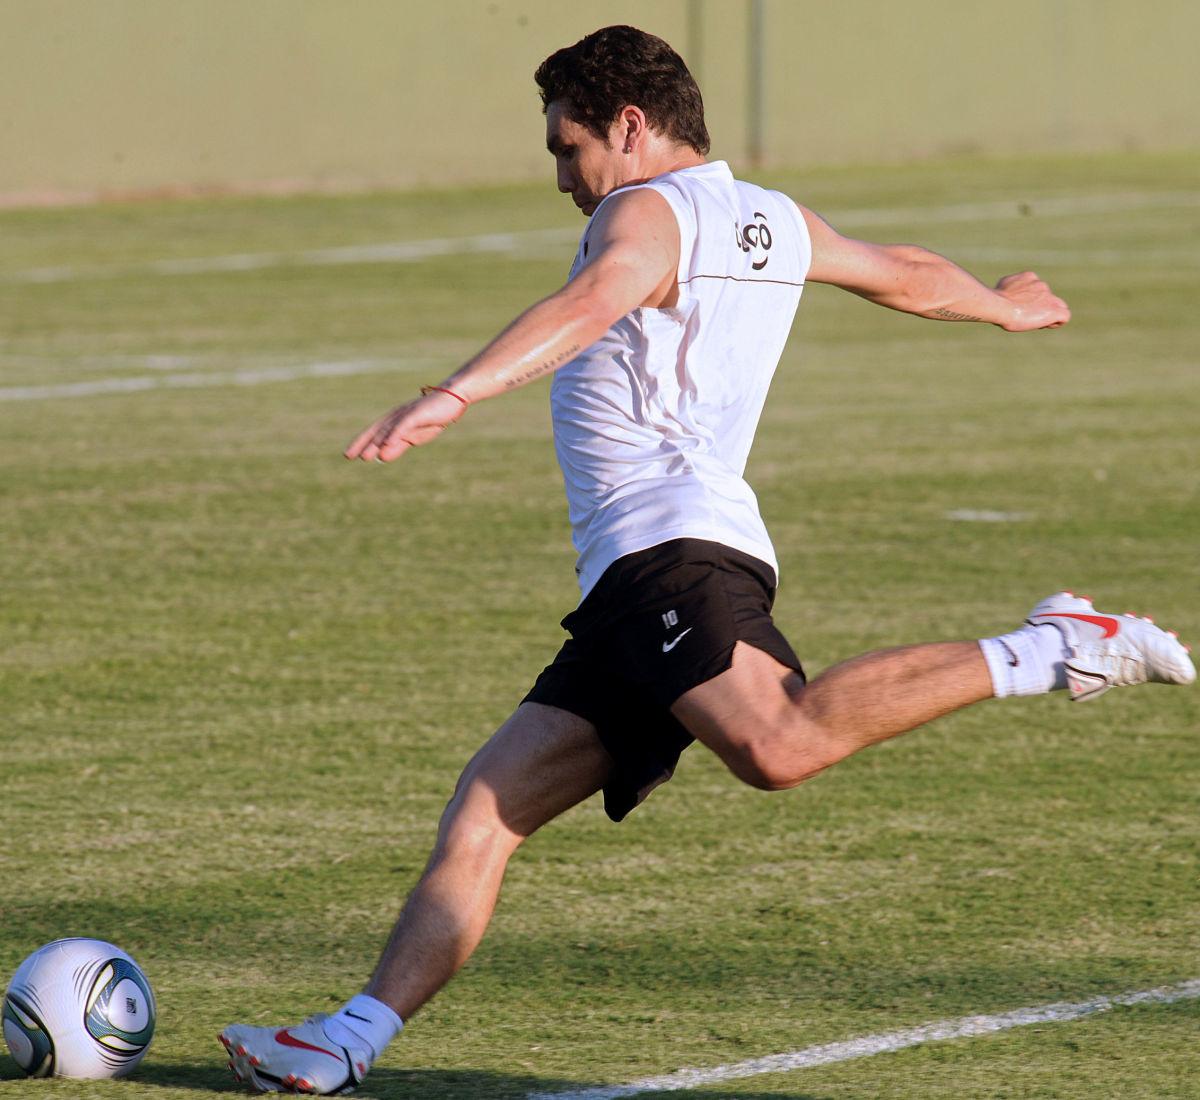 paraguayan-football-player-salvador-caba-5bbbcd8a0d9e2bdb4a000001.jpg